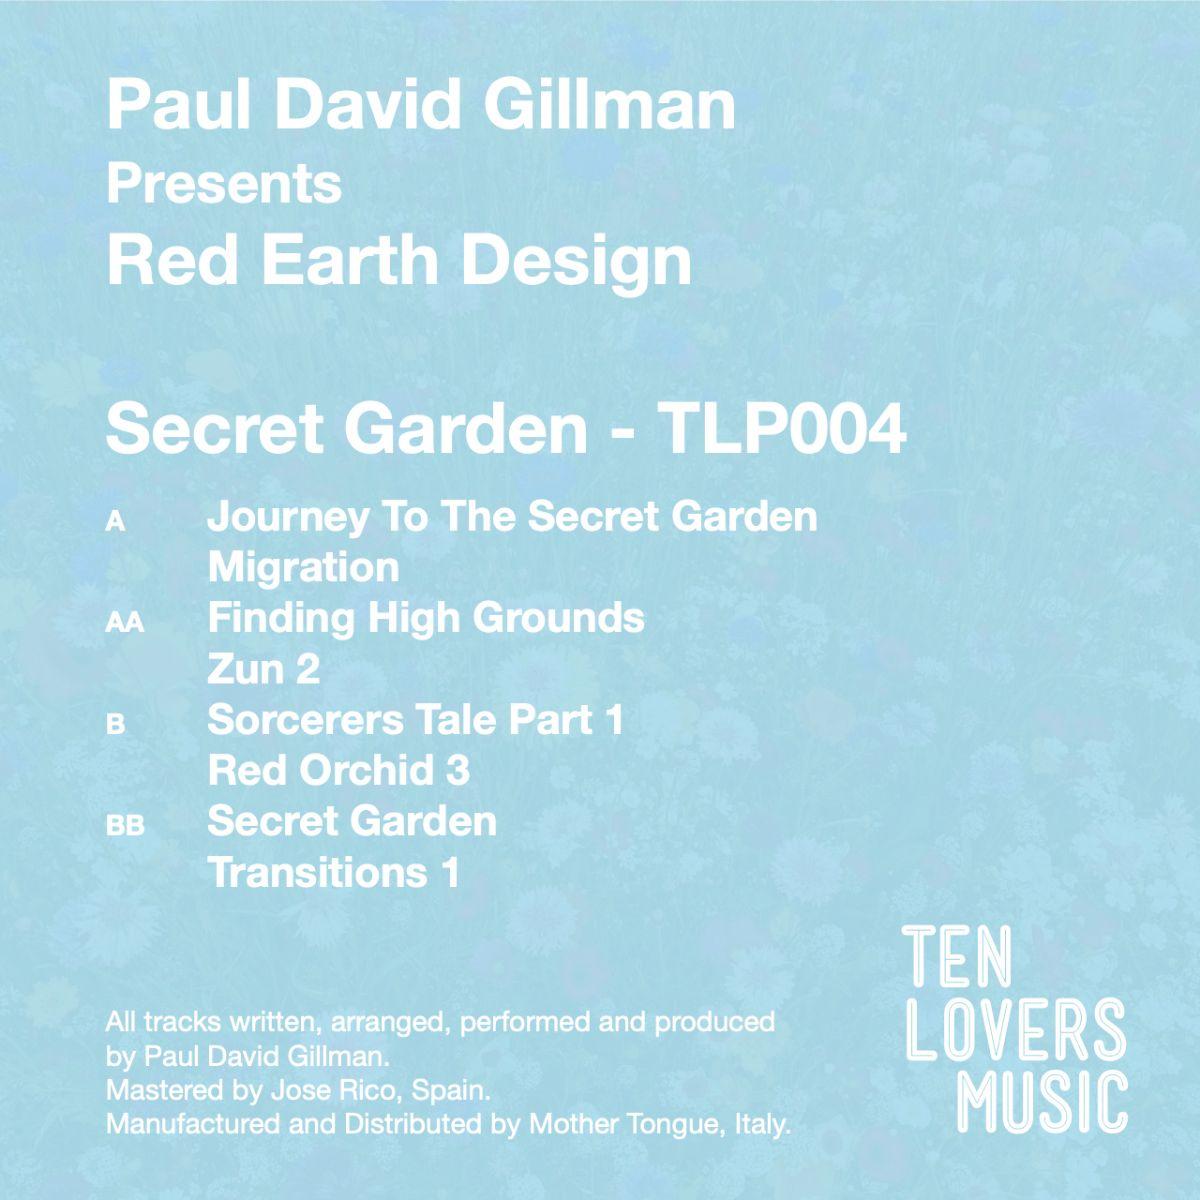 Red Earth Design/SECRET GARDEN DLP